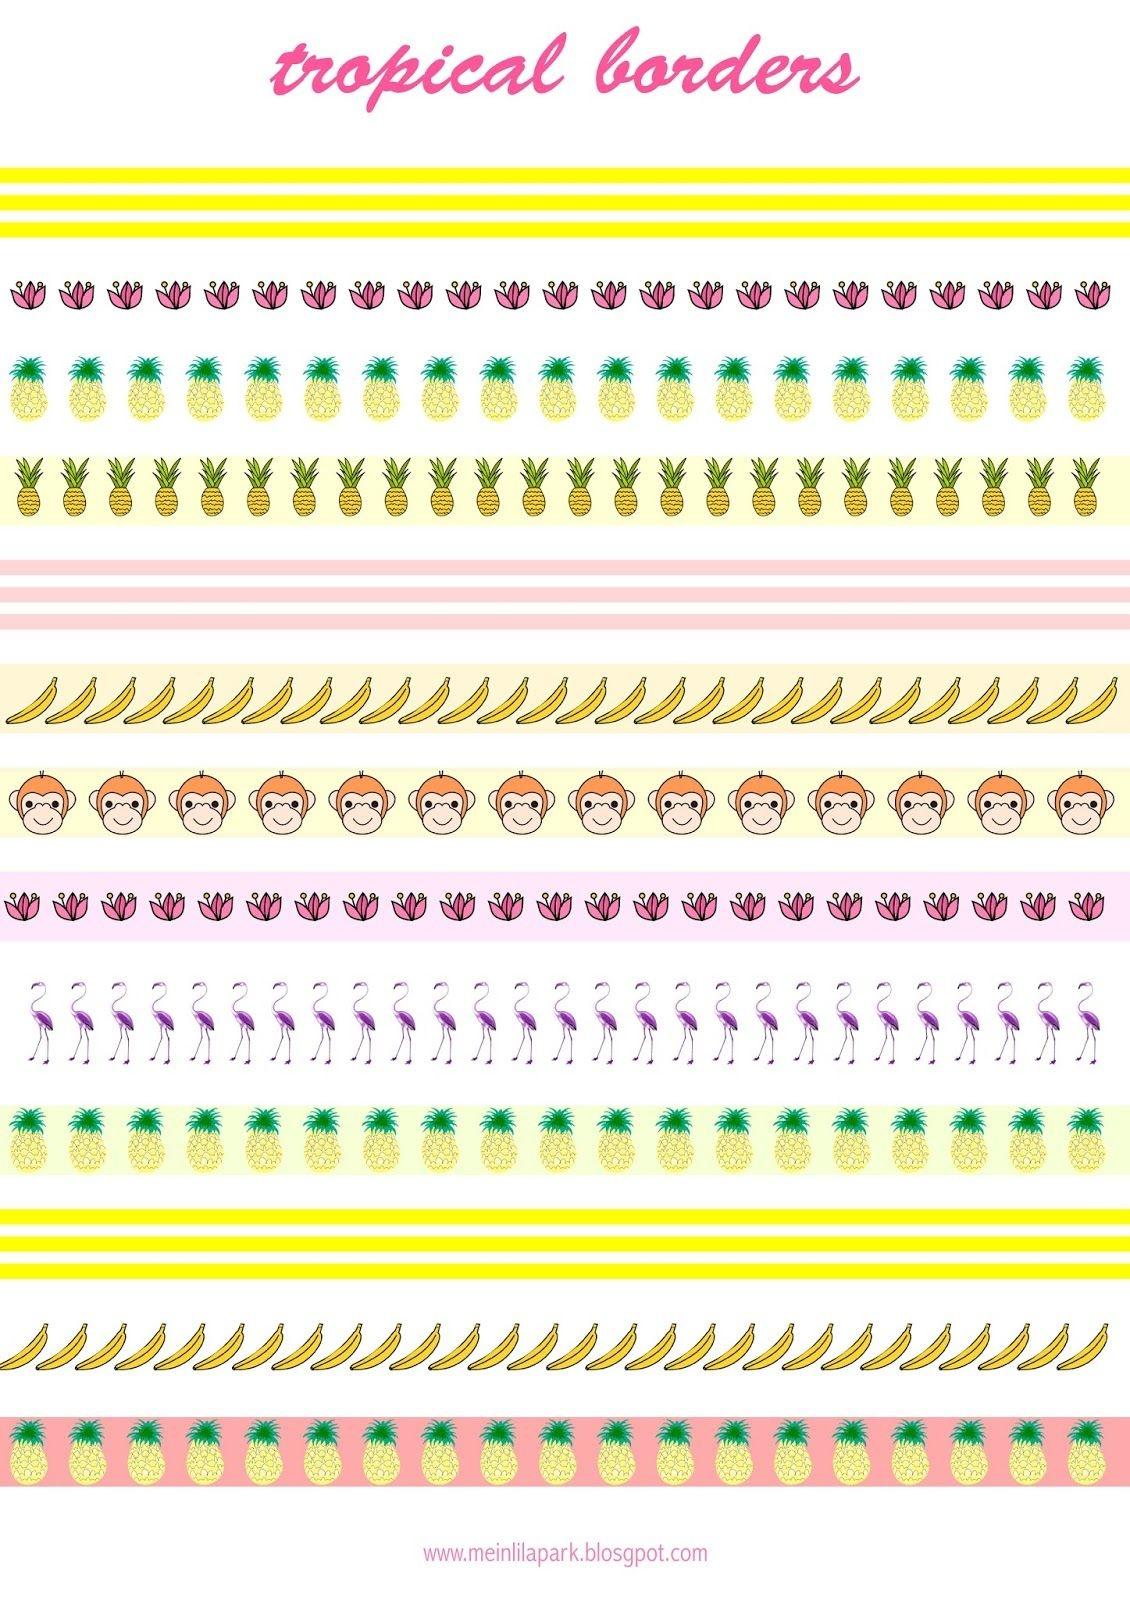 Free Printable Tropical Borders - Planner Stickers - Freebie - Free Printable Summer Borders